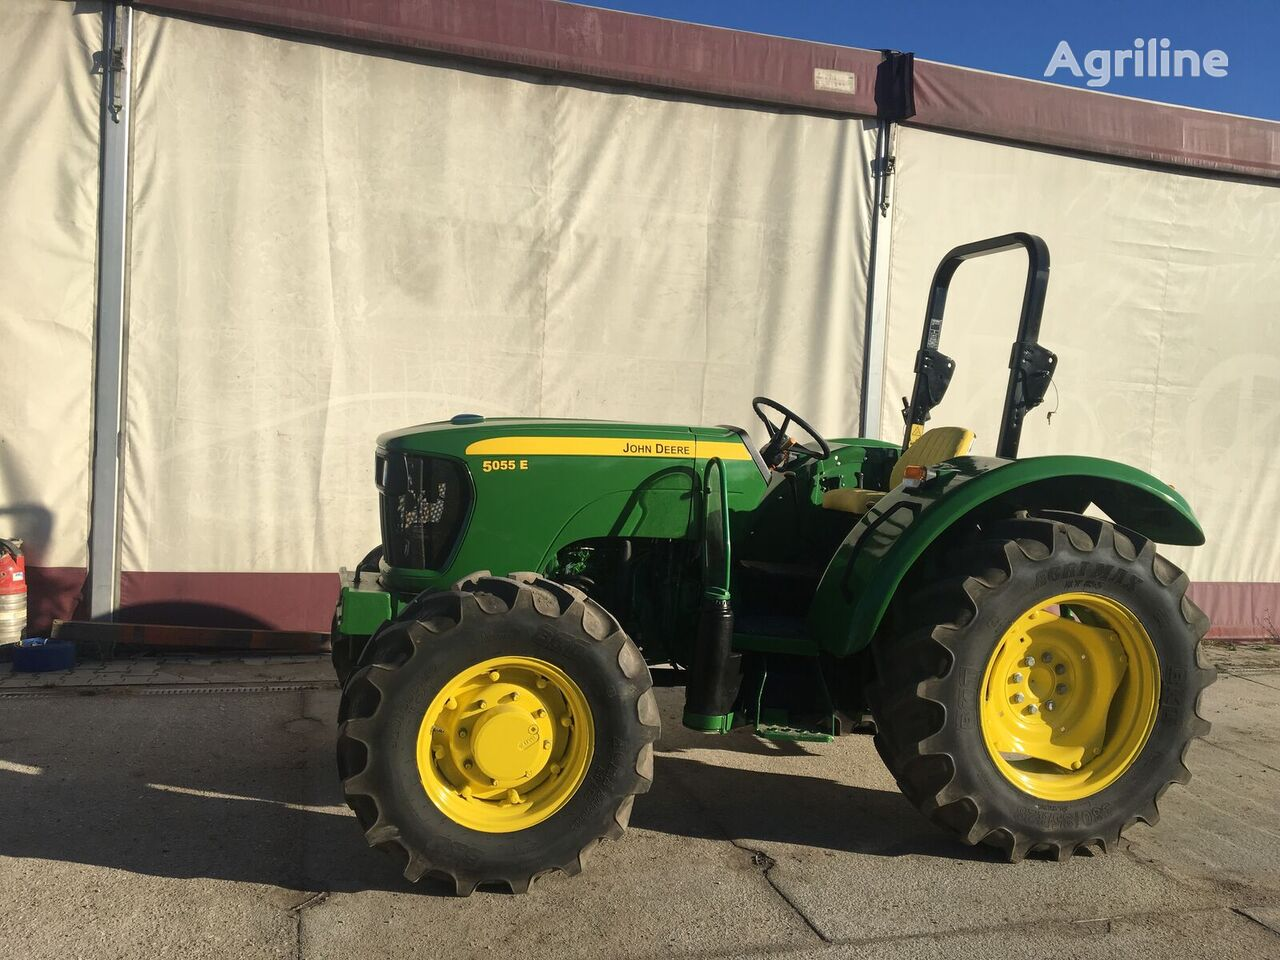 JOHN DEERE 5055E wheel tractor